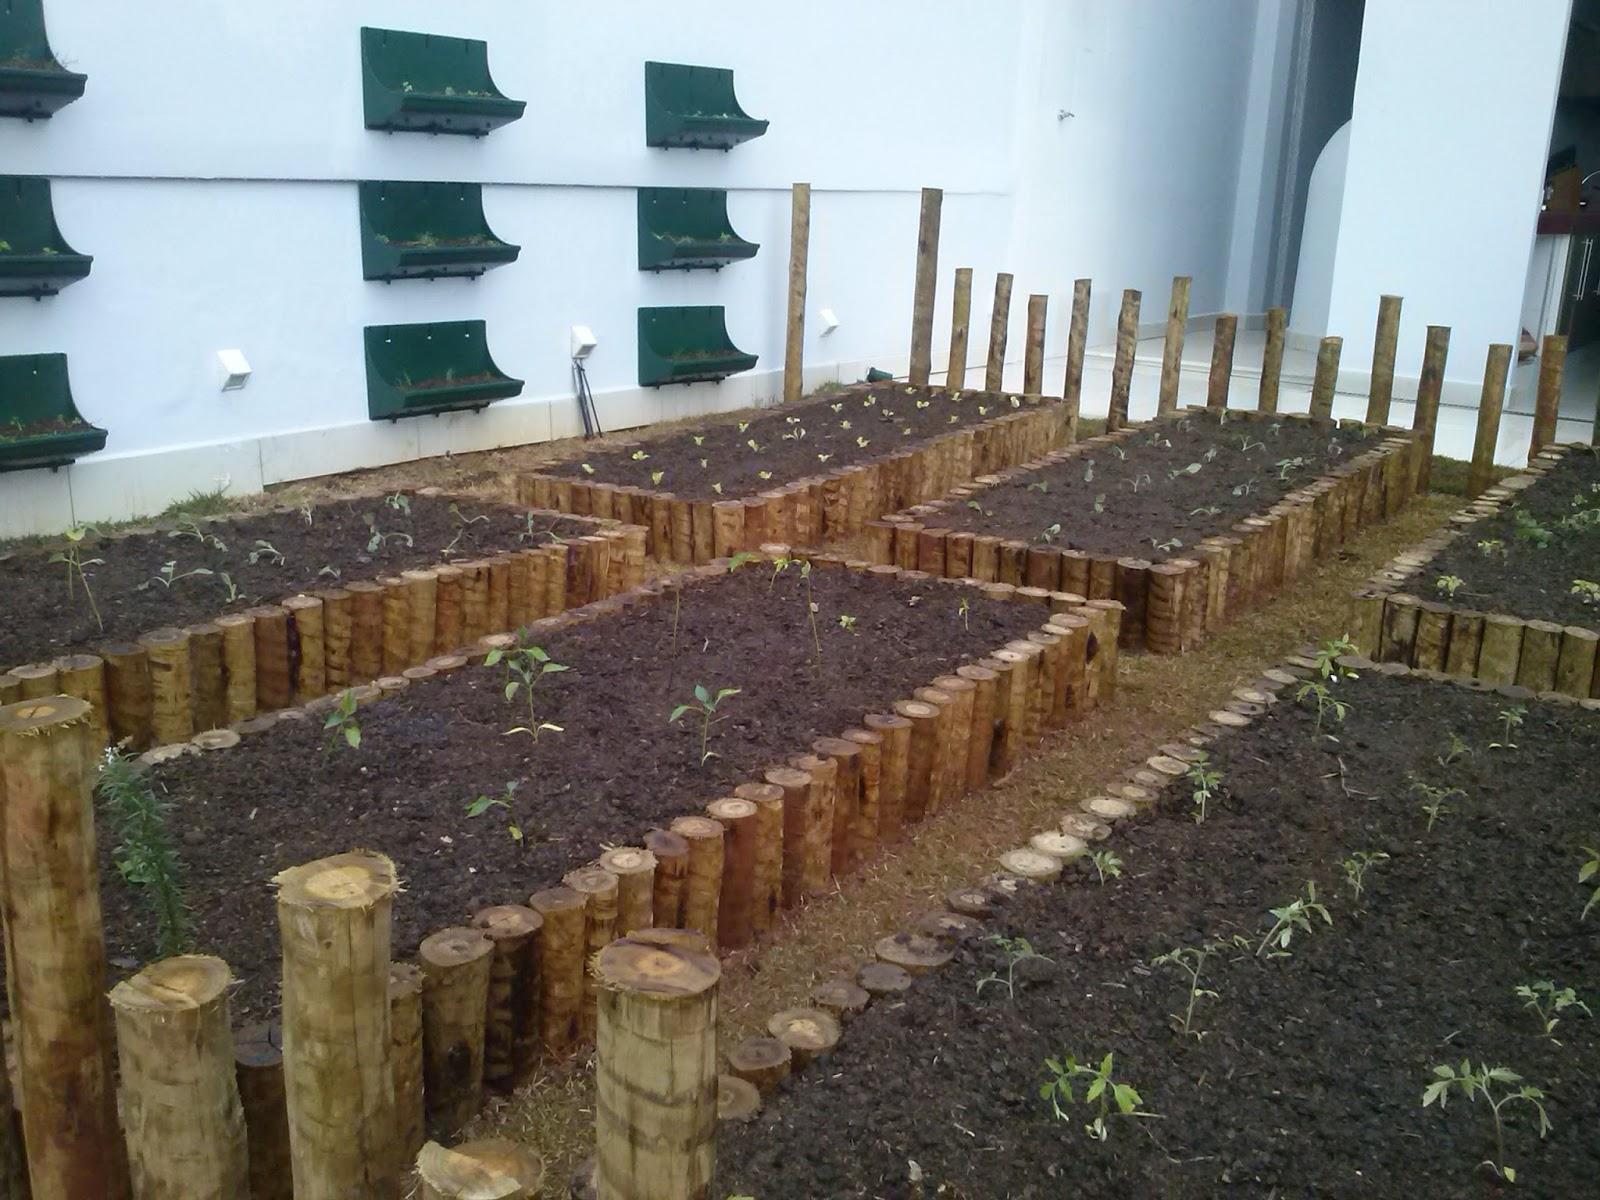 preparar o melhor substrato : substrato para plantas